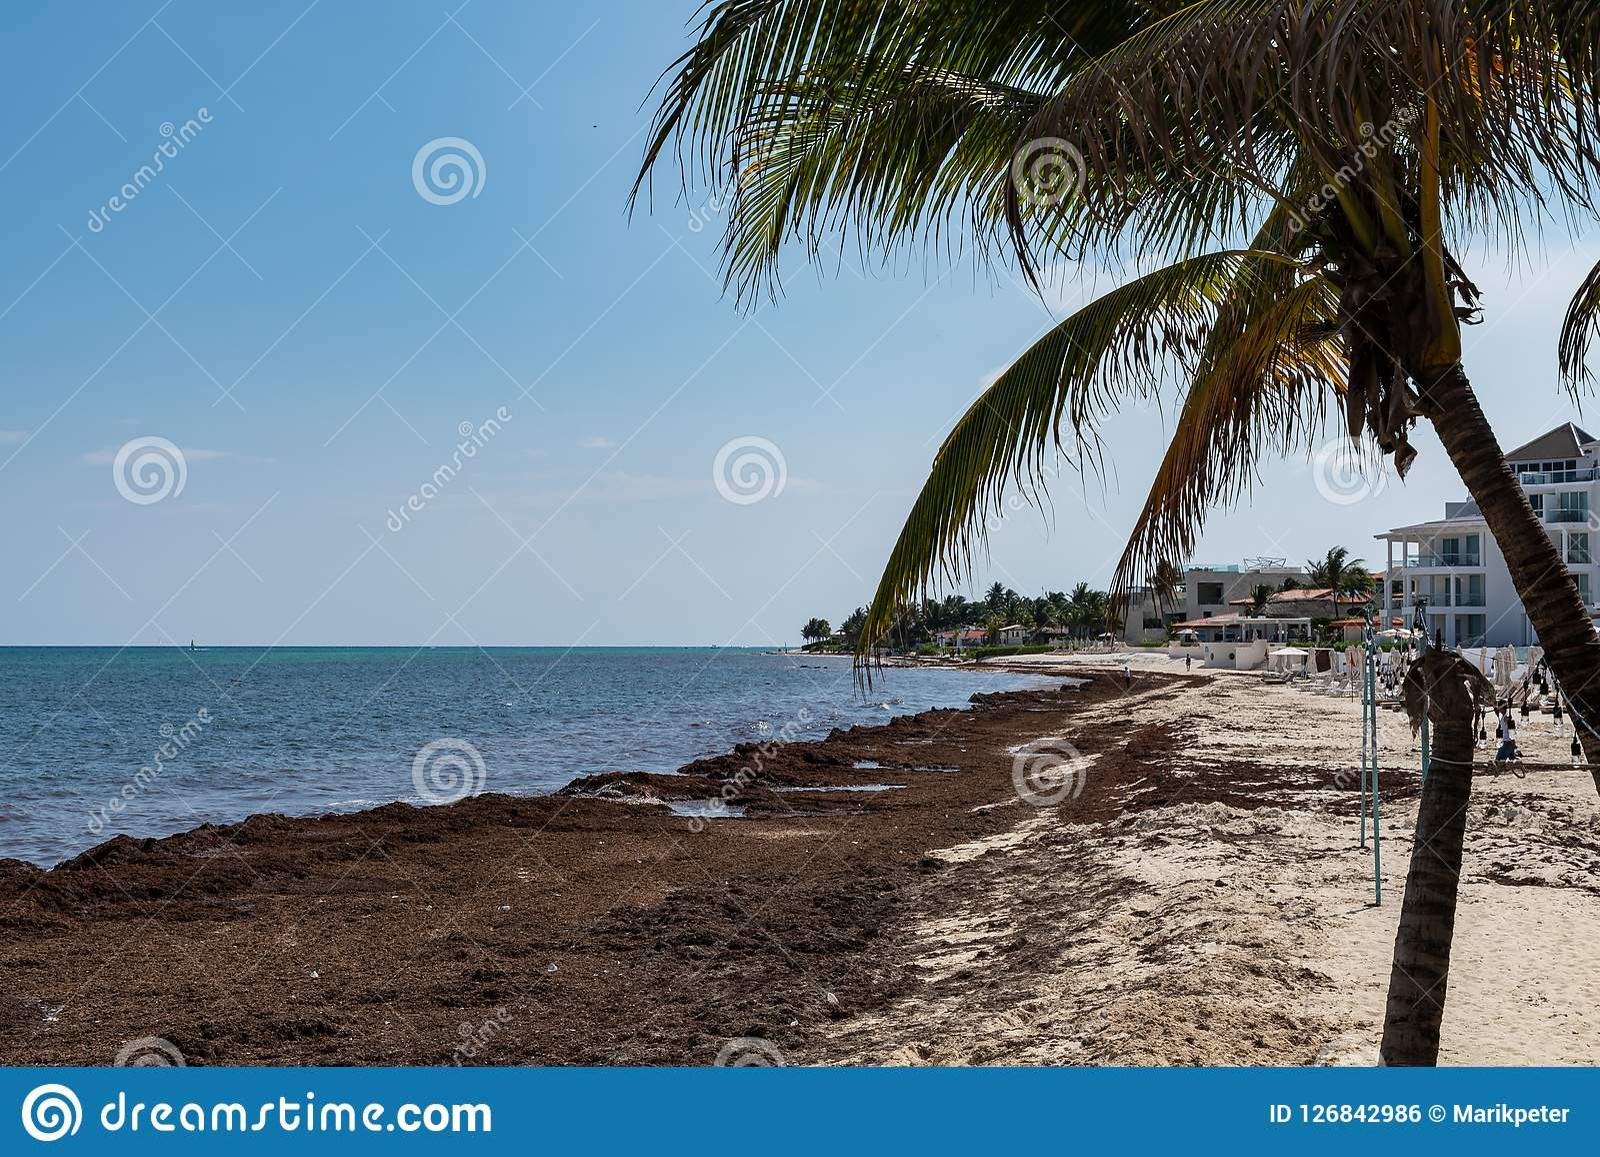 Sargassum Seaweed Sea Algae Problem On The Beach Of Mexico Stock